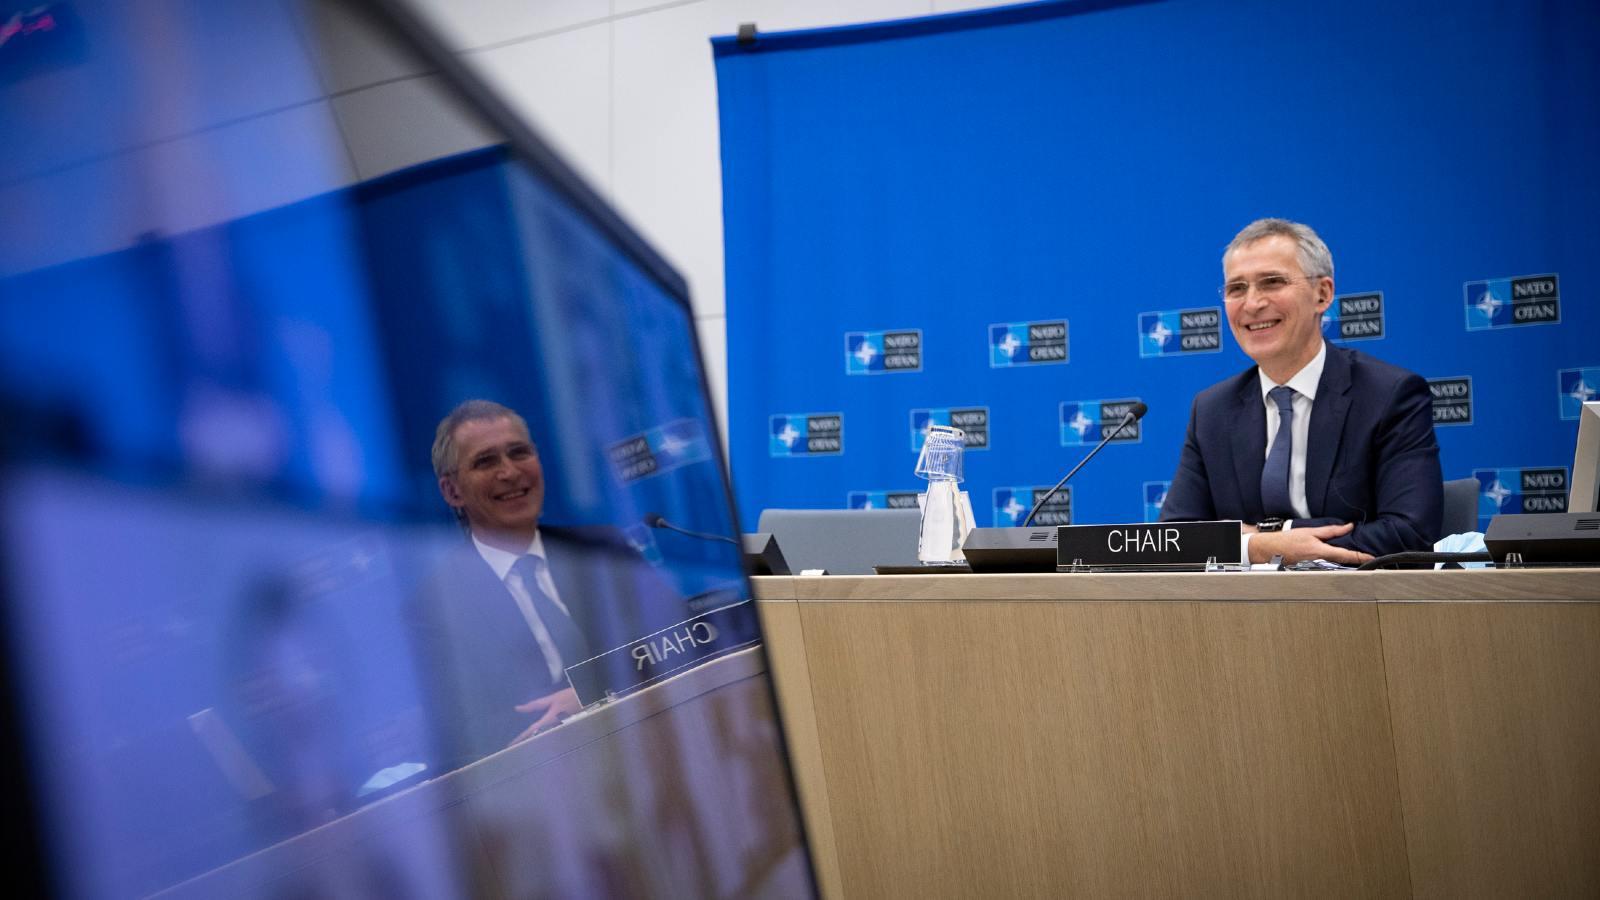 NATO Secretary General Jens Stoltenberg. November 25, 2020